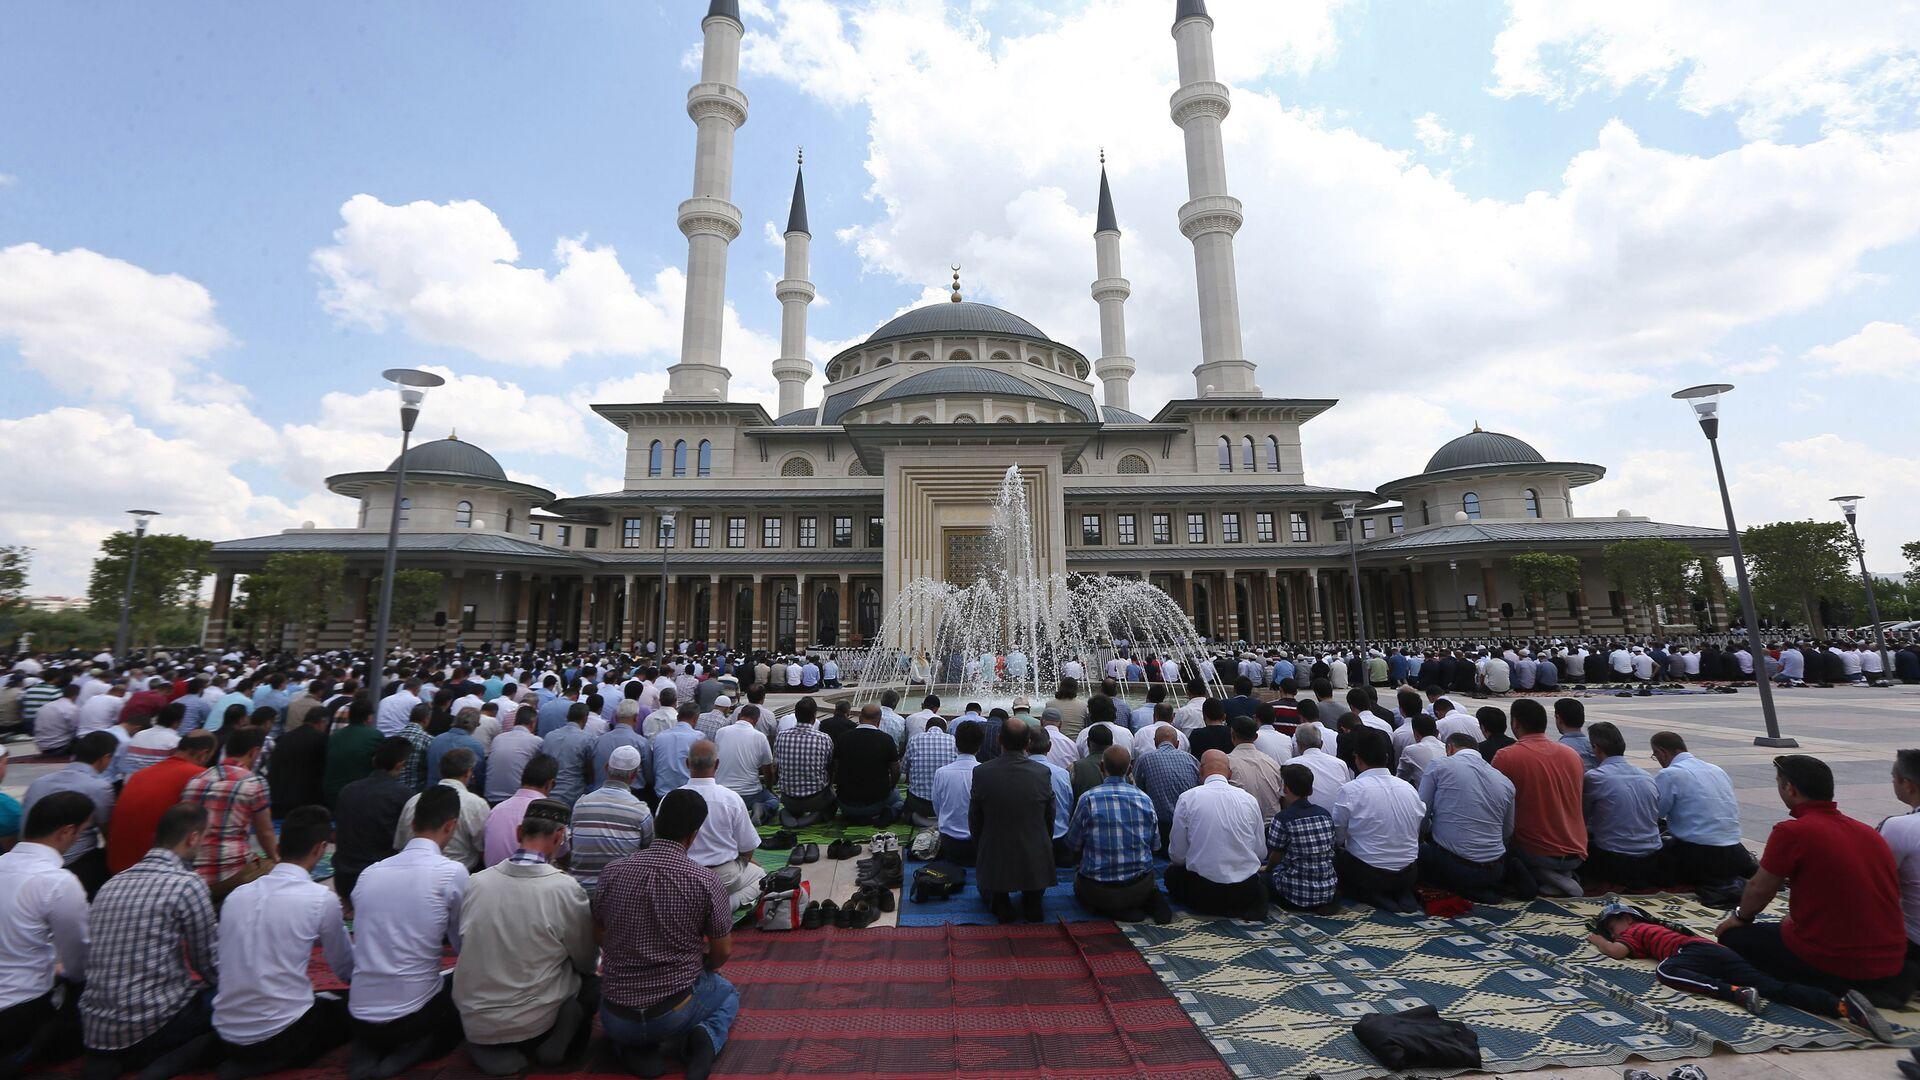 Турецкие мусульмане молятся на территории президентского дворца Турции в Анкаре - Sputnik Грузия, 1920, 06.09.2021